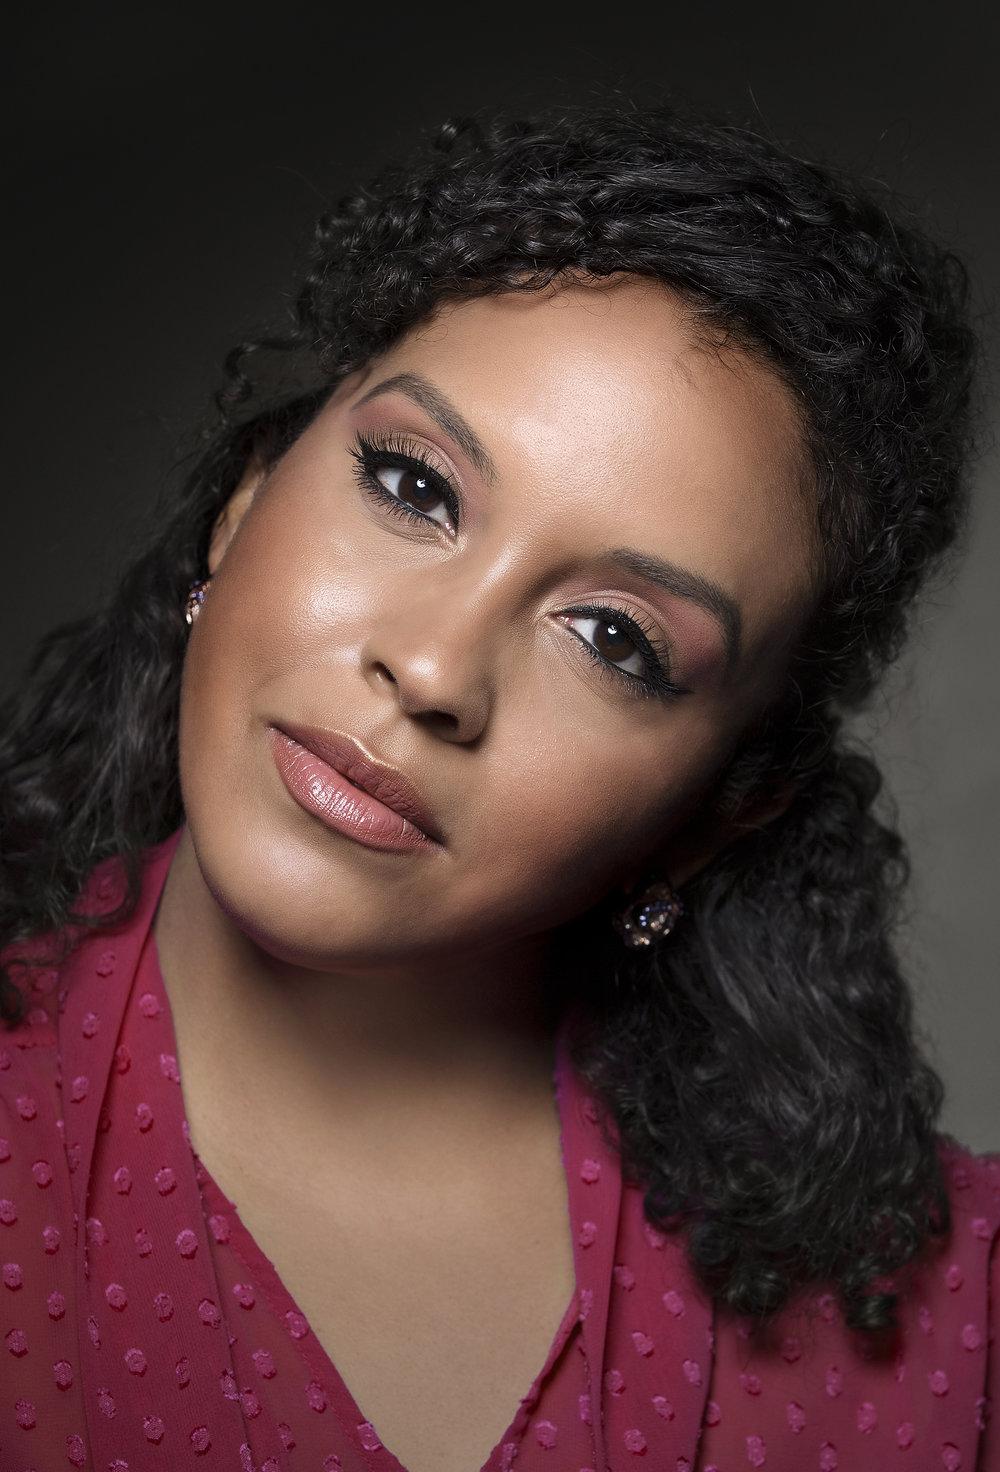 Simple Pink Makeup Jordana Cosmetics - Miriam Morales-Beauty Blogger